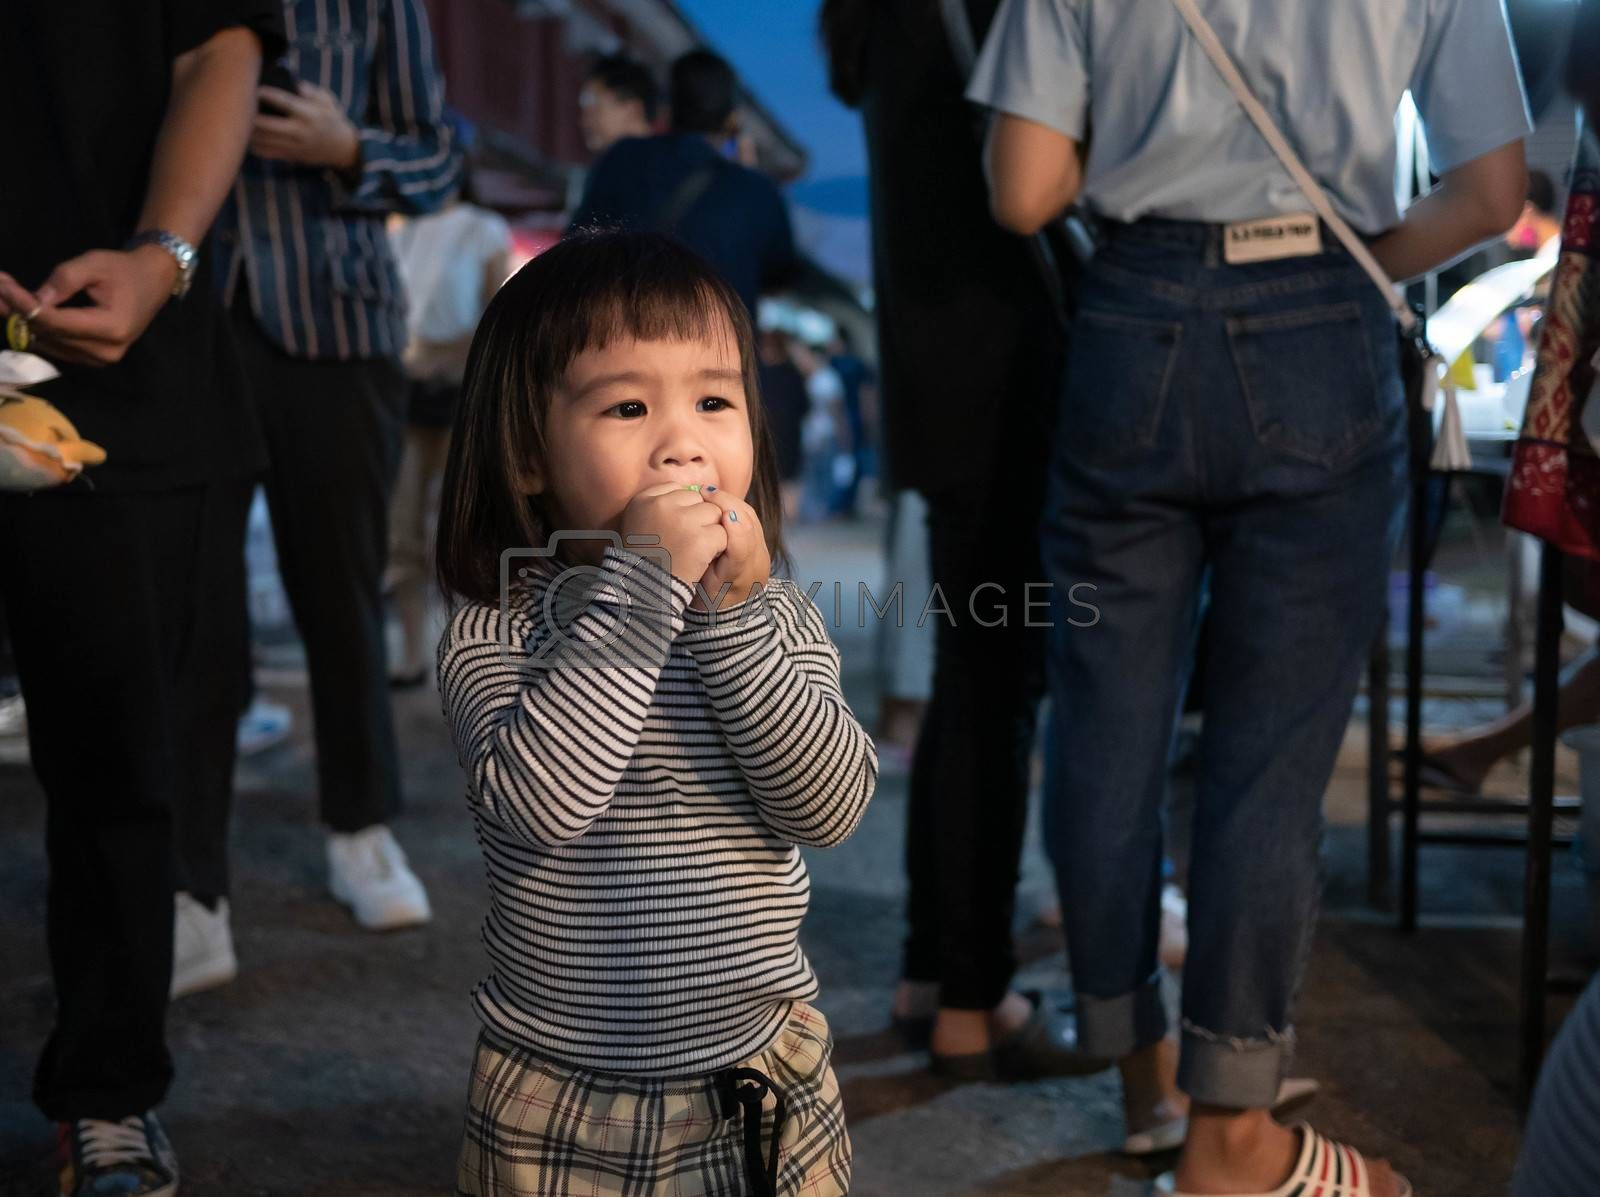 Lampang, Thailand; 5 October 2019 - Adorable Asian child girl having fun with Dracula teeth plastic toys in Kad Kong Ta Walking Street.